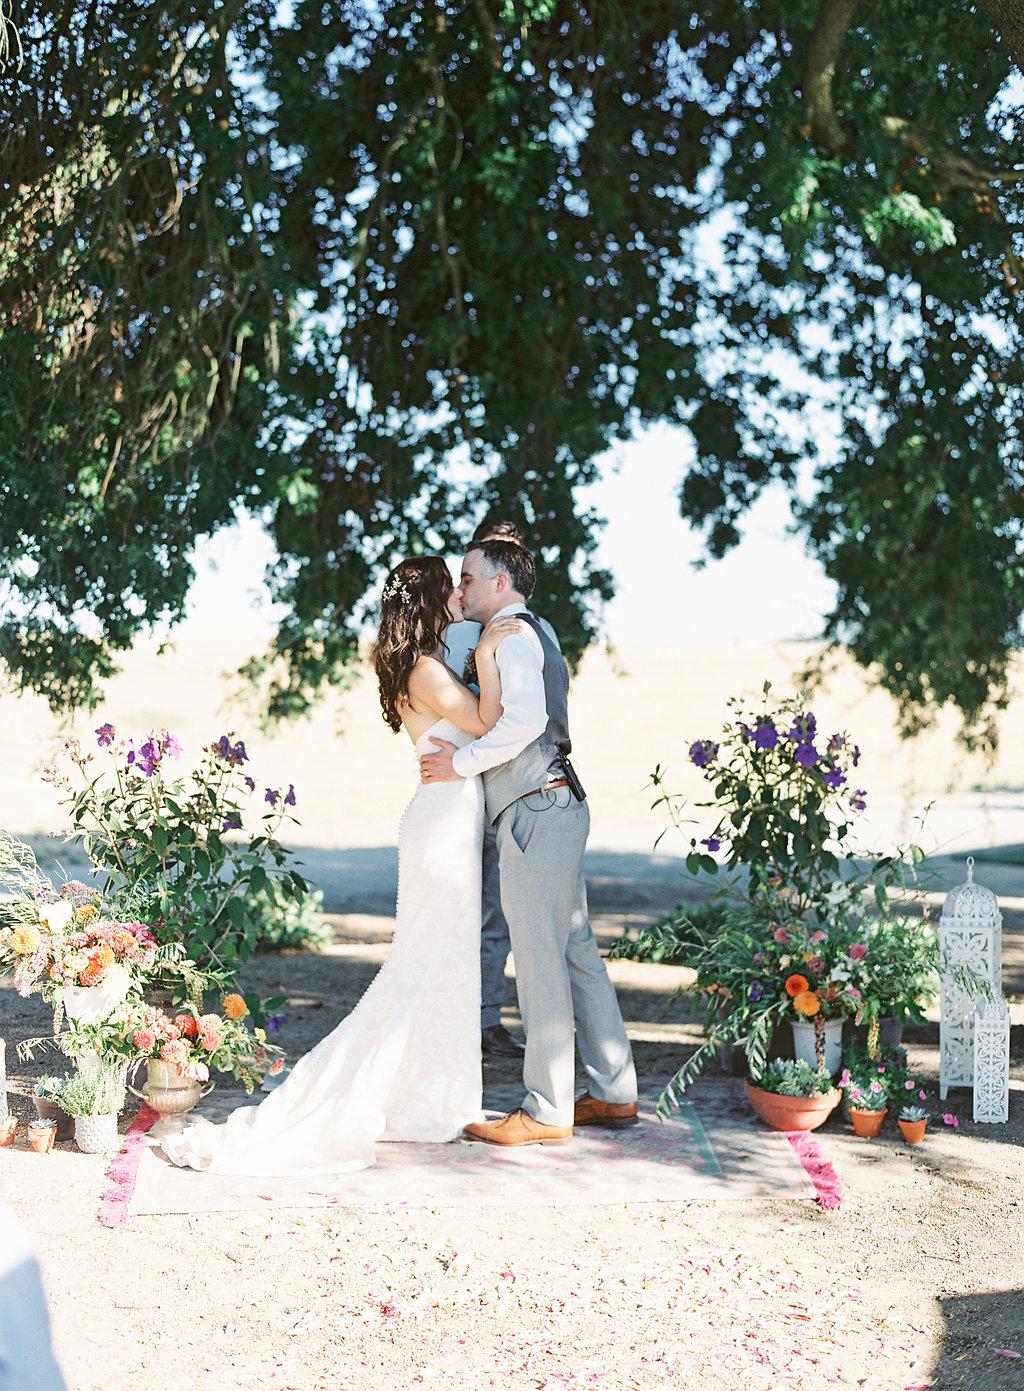 Meghan Mehan Photography - California Wedding Photography - Sacramento Wedding 046.jpg